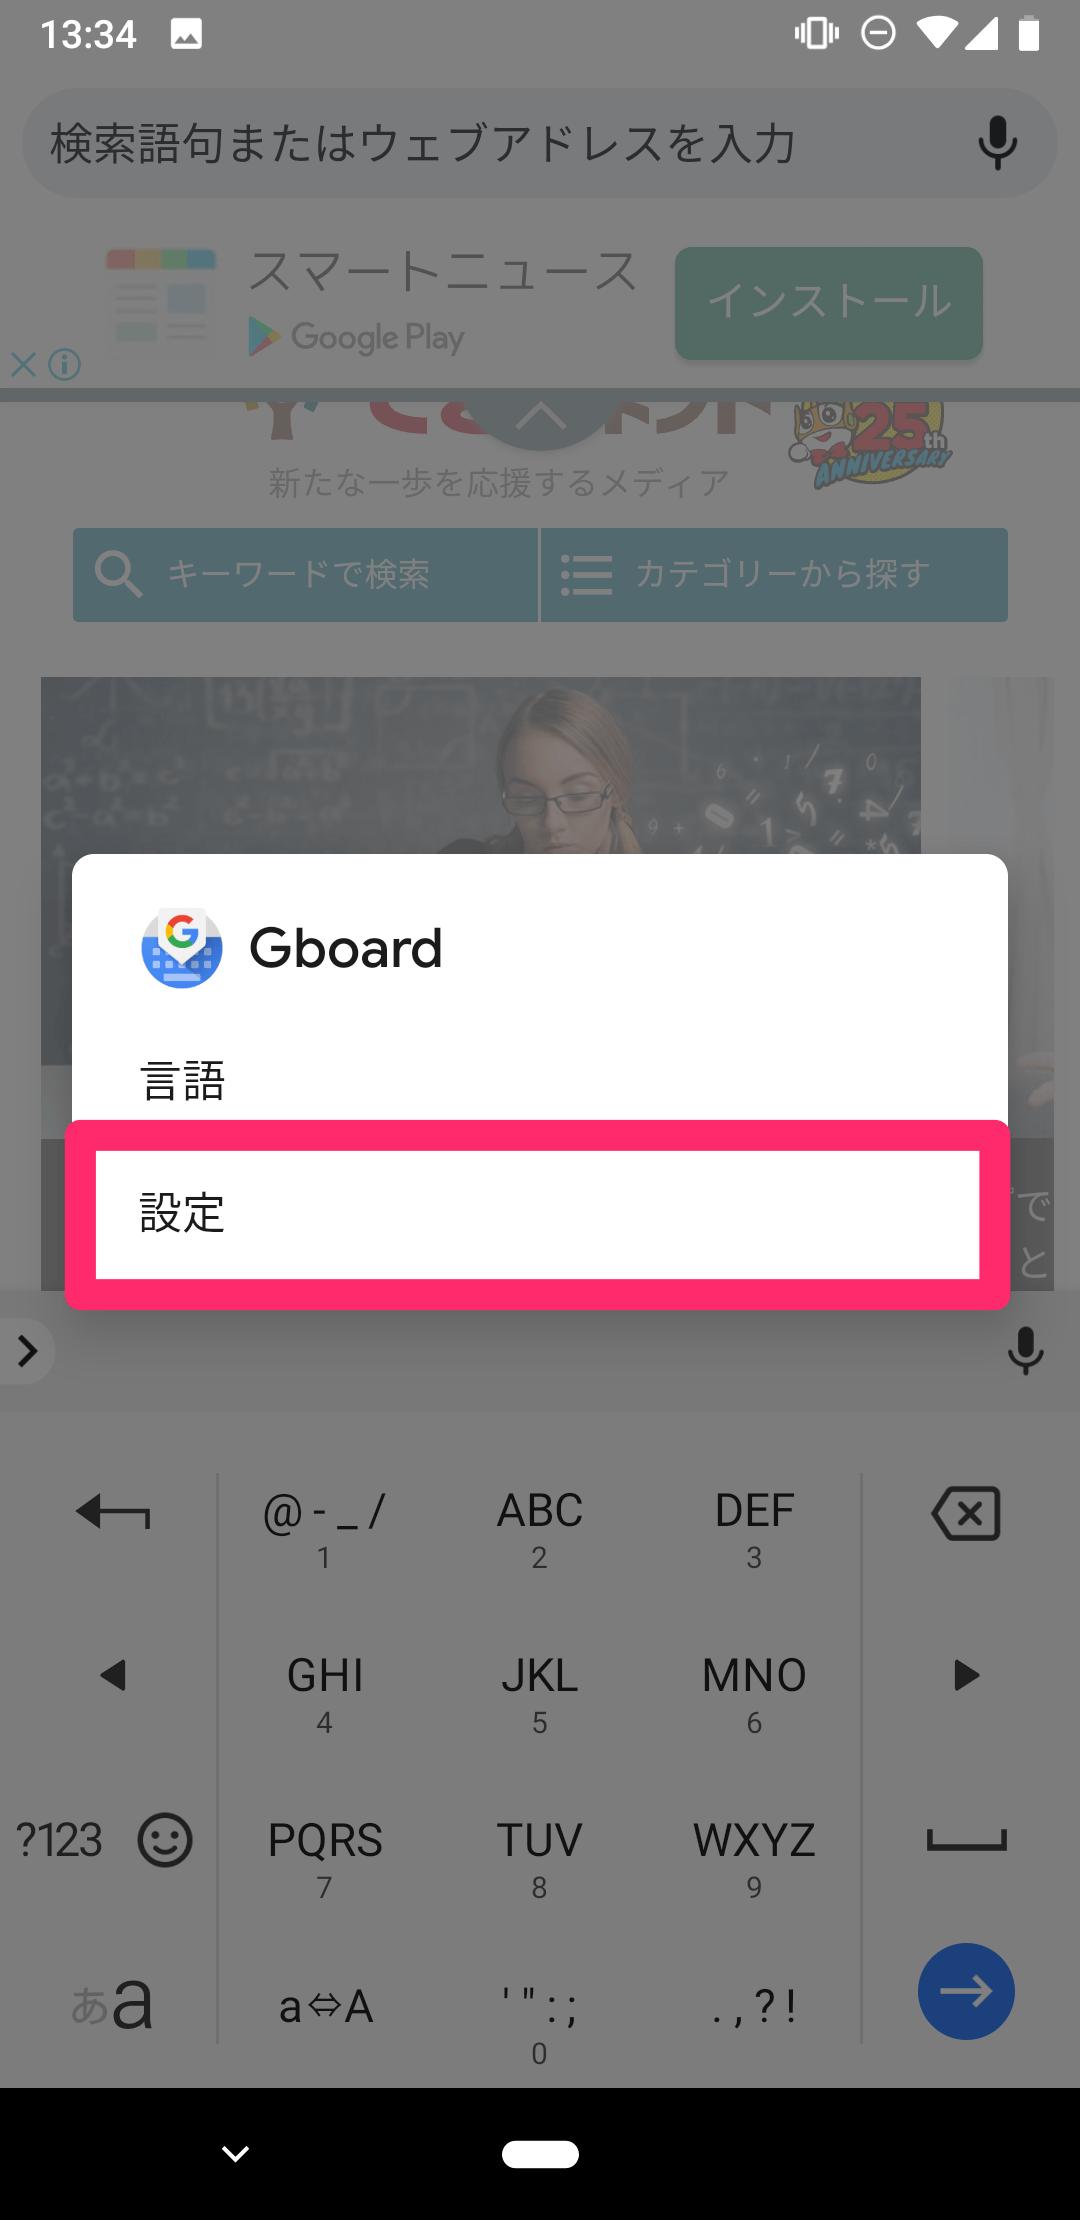 Androidの英語入力をフルキーボード(QWERTY配列)に変更する方法[Gboard対応]